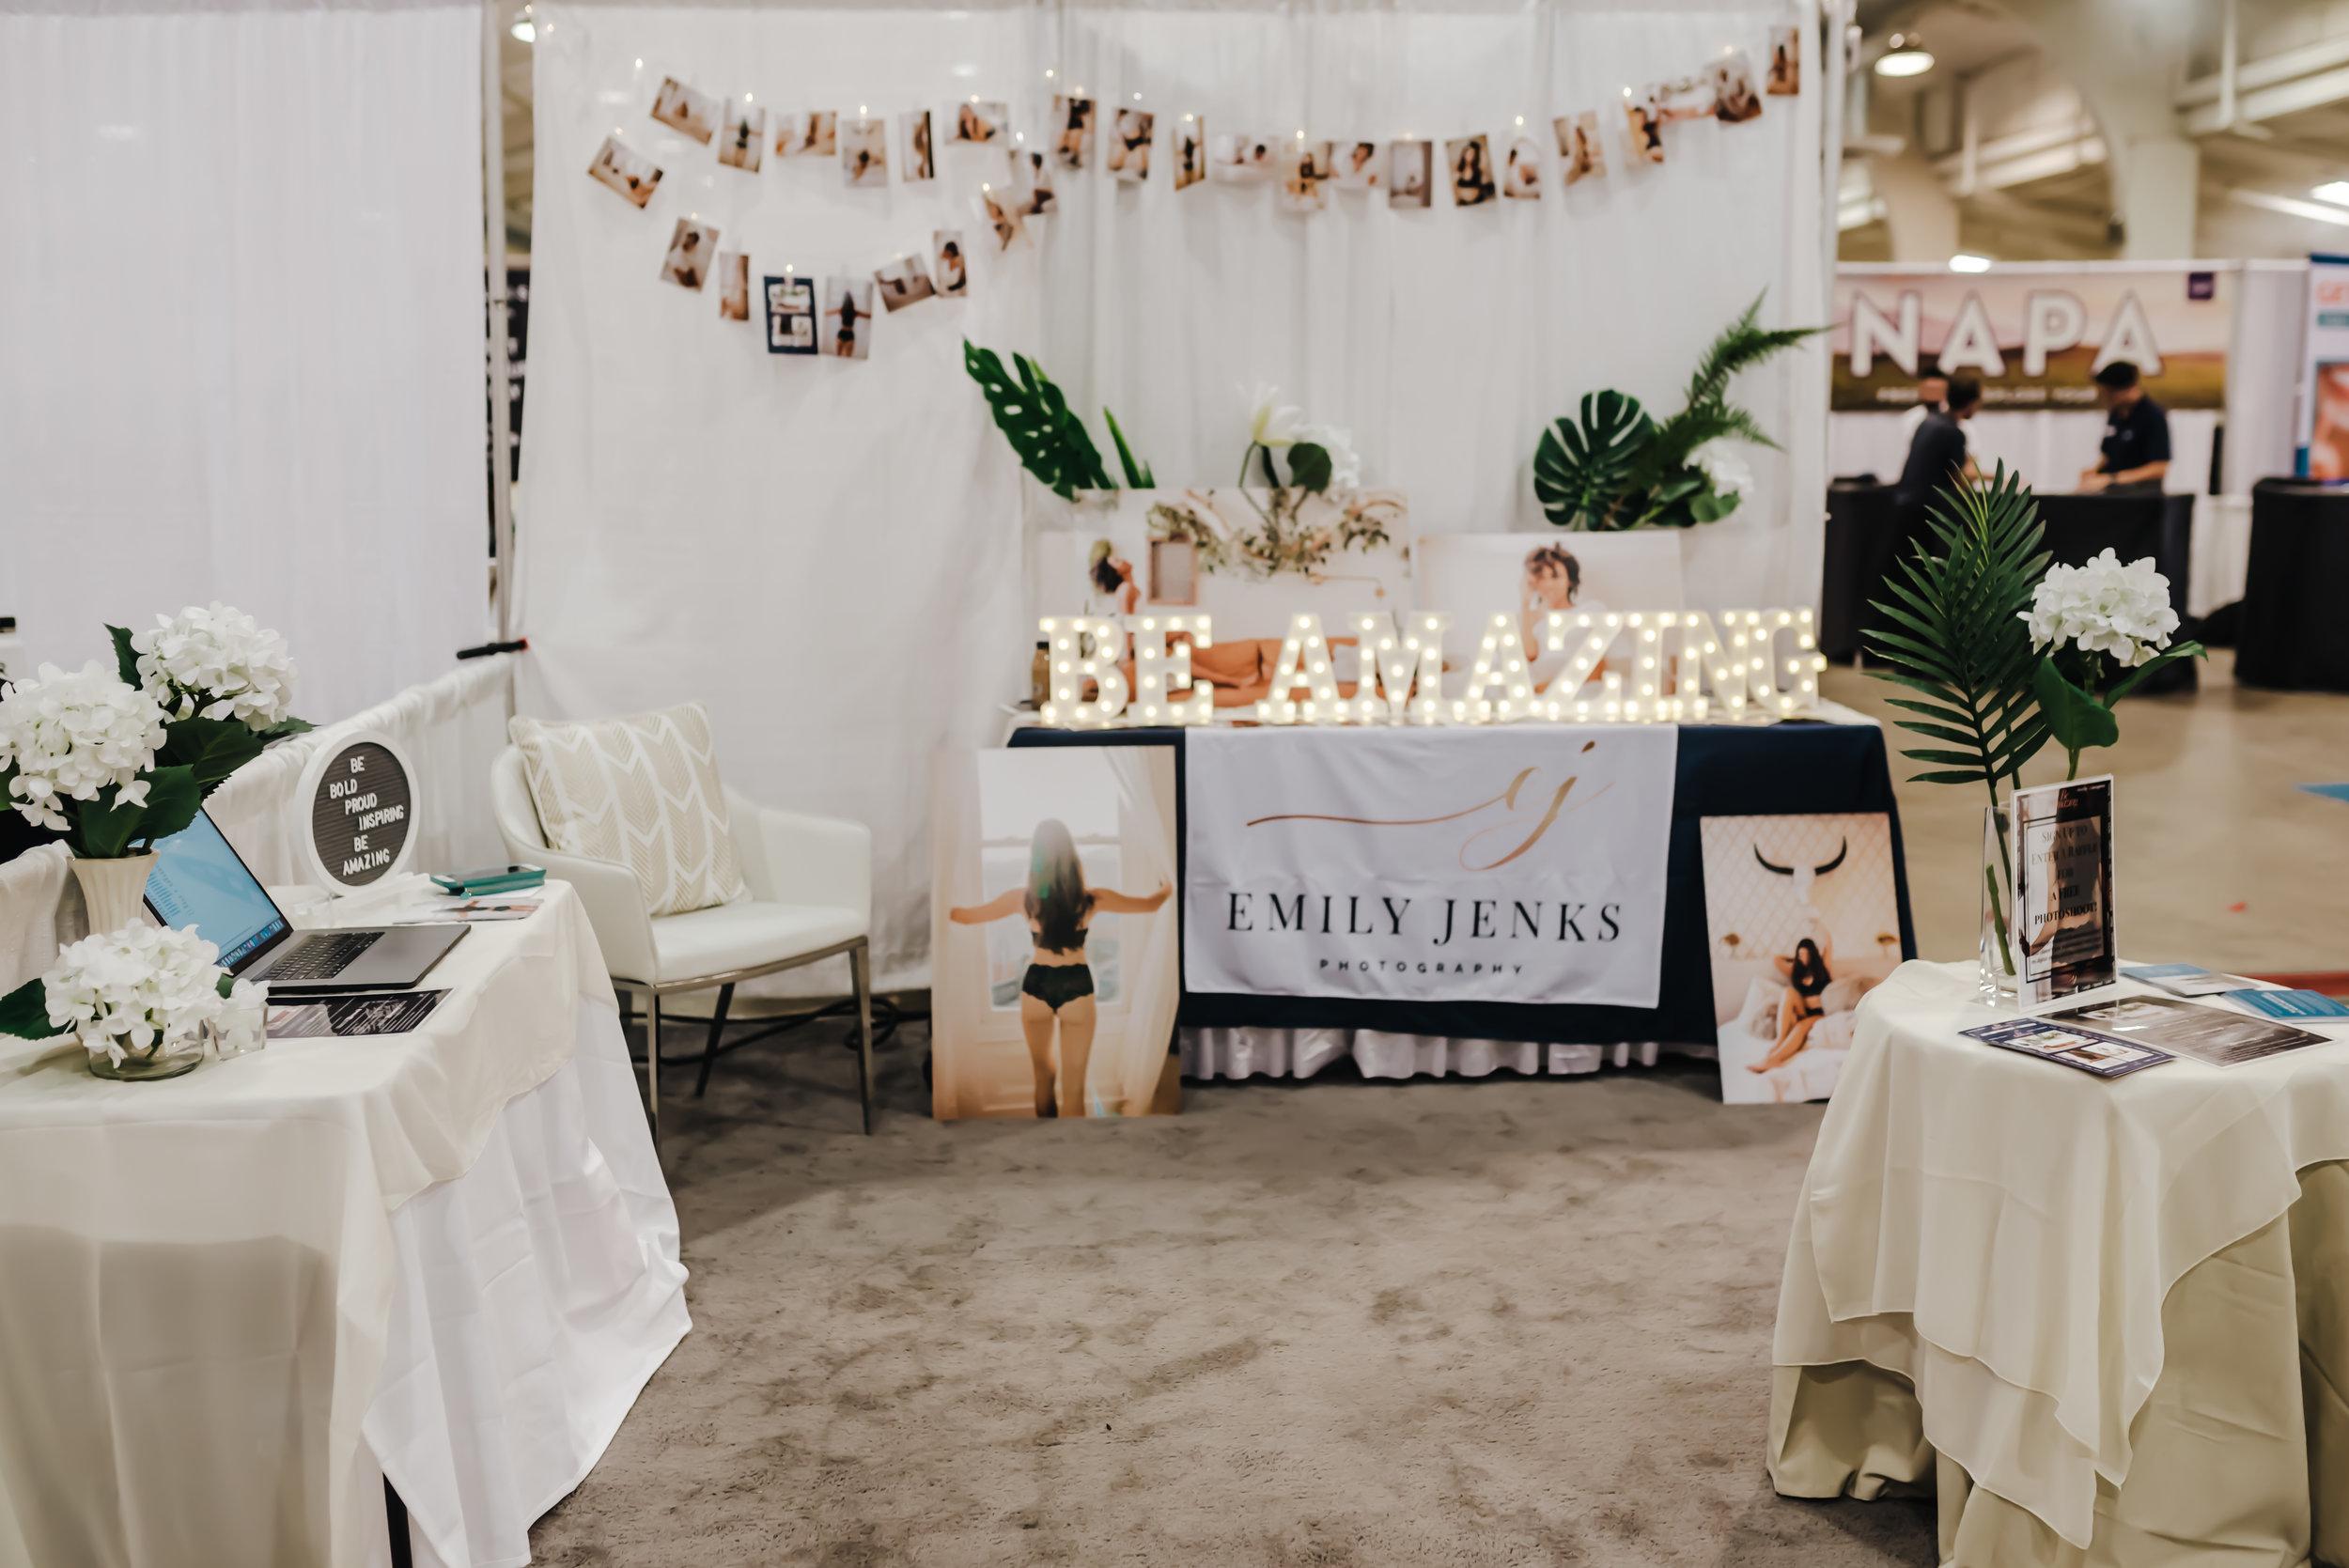 1.19.2019 California Bridal Expo Booth.jpg